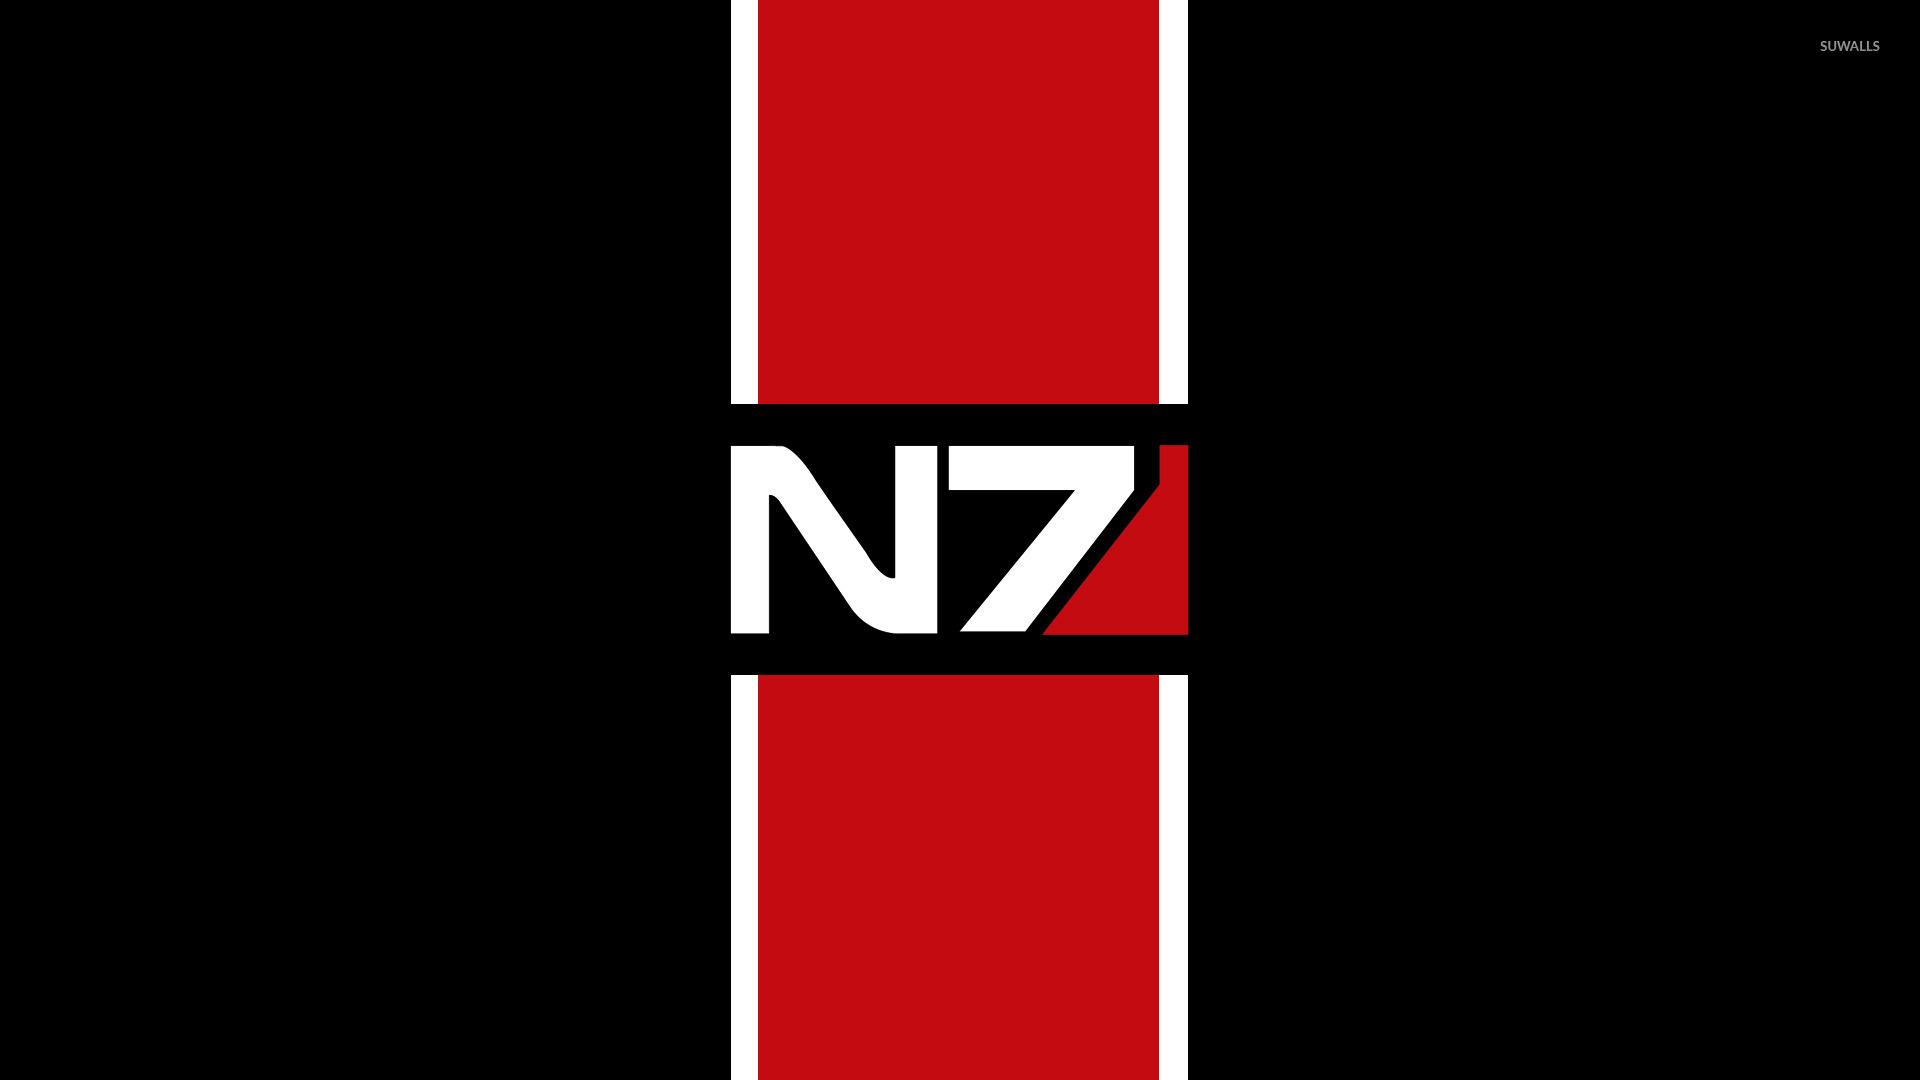 N7 wallpaper - SF Wallpaper